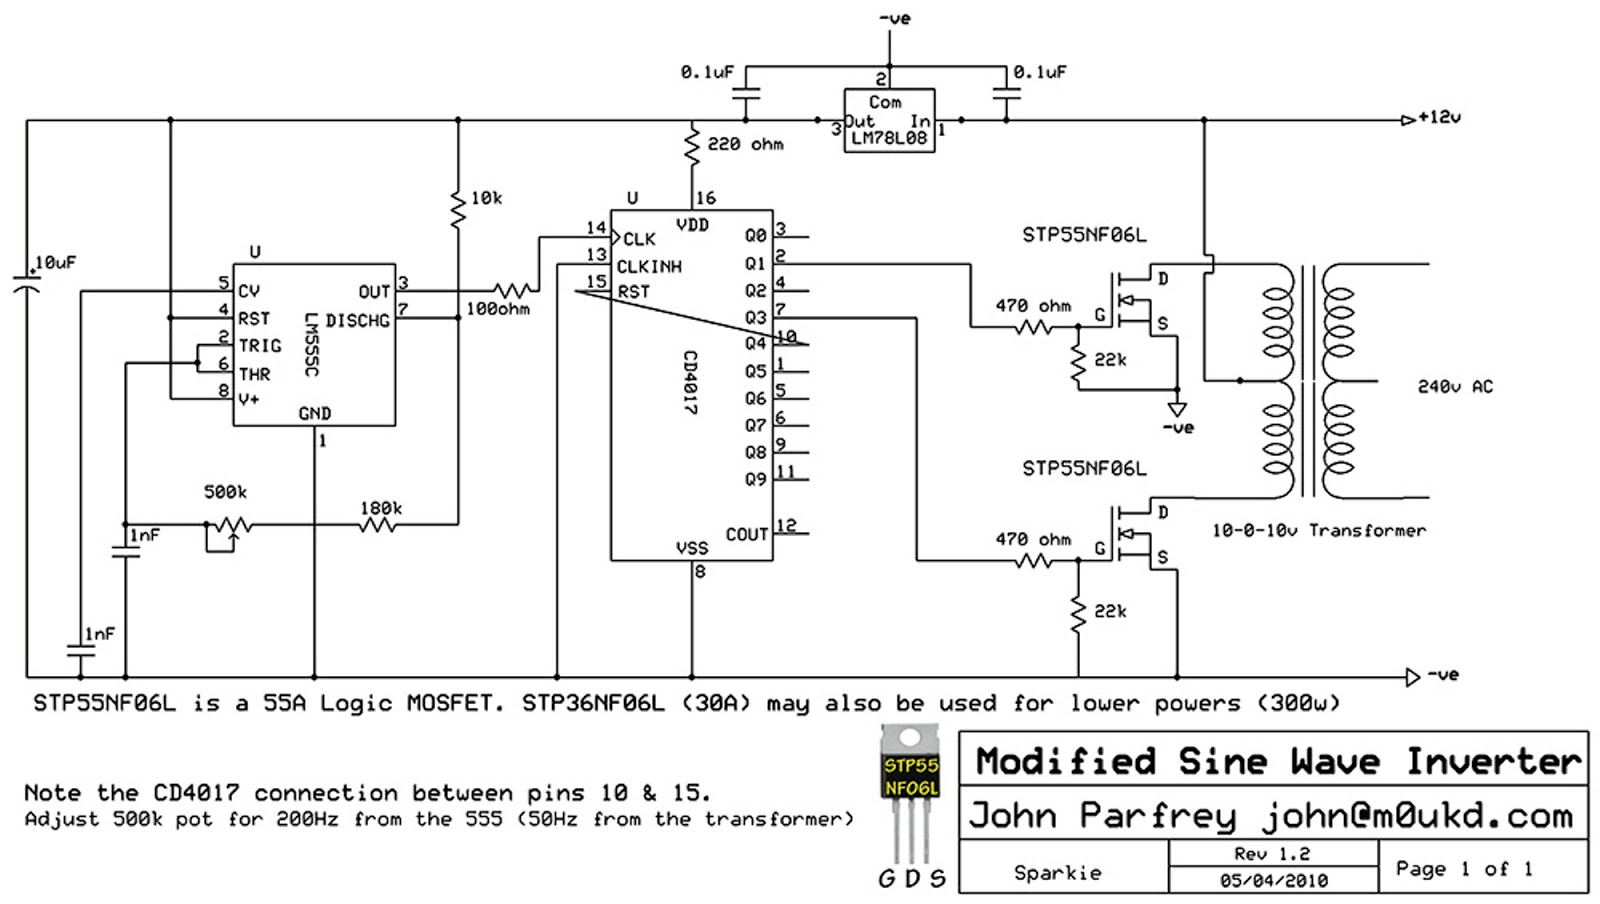 12vdc to 12vac converter circuit diagram john deere wiring symbols download 12v dc ac